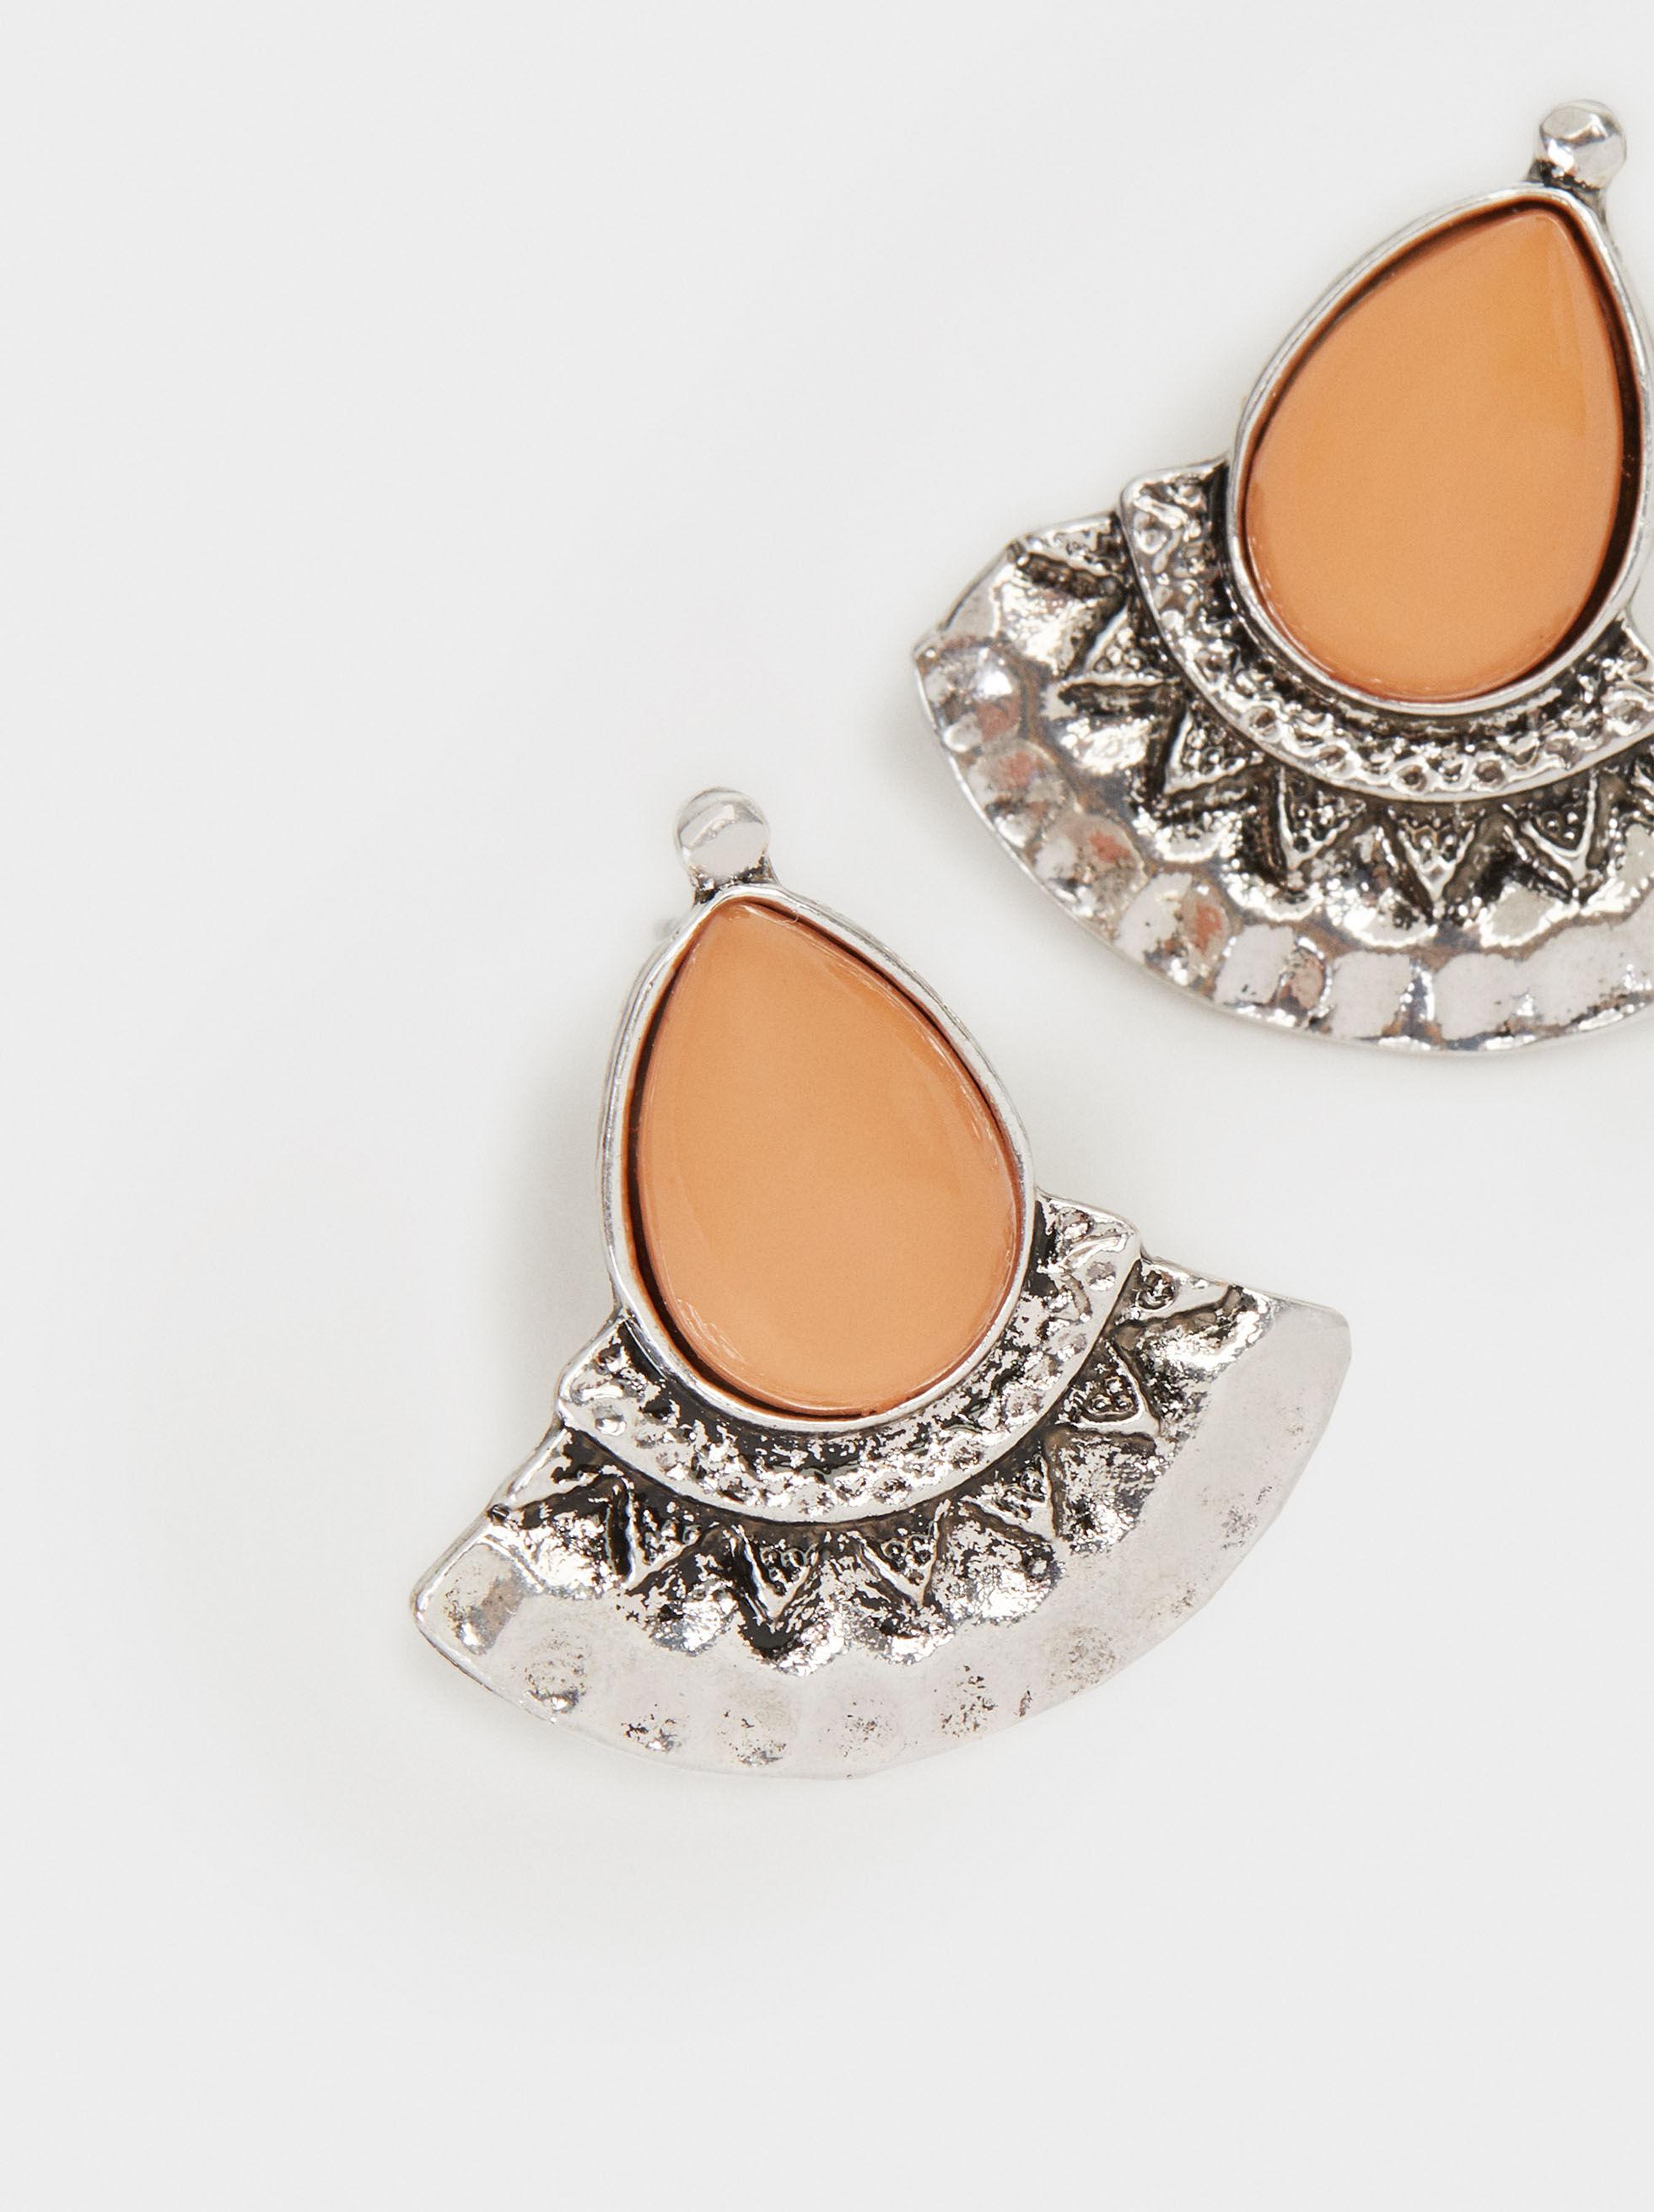 Star Valley Short Earrings, Multicolor, hi-res